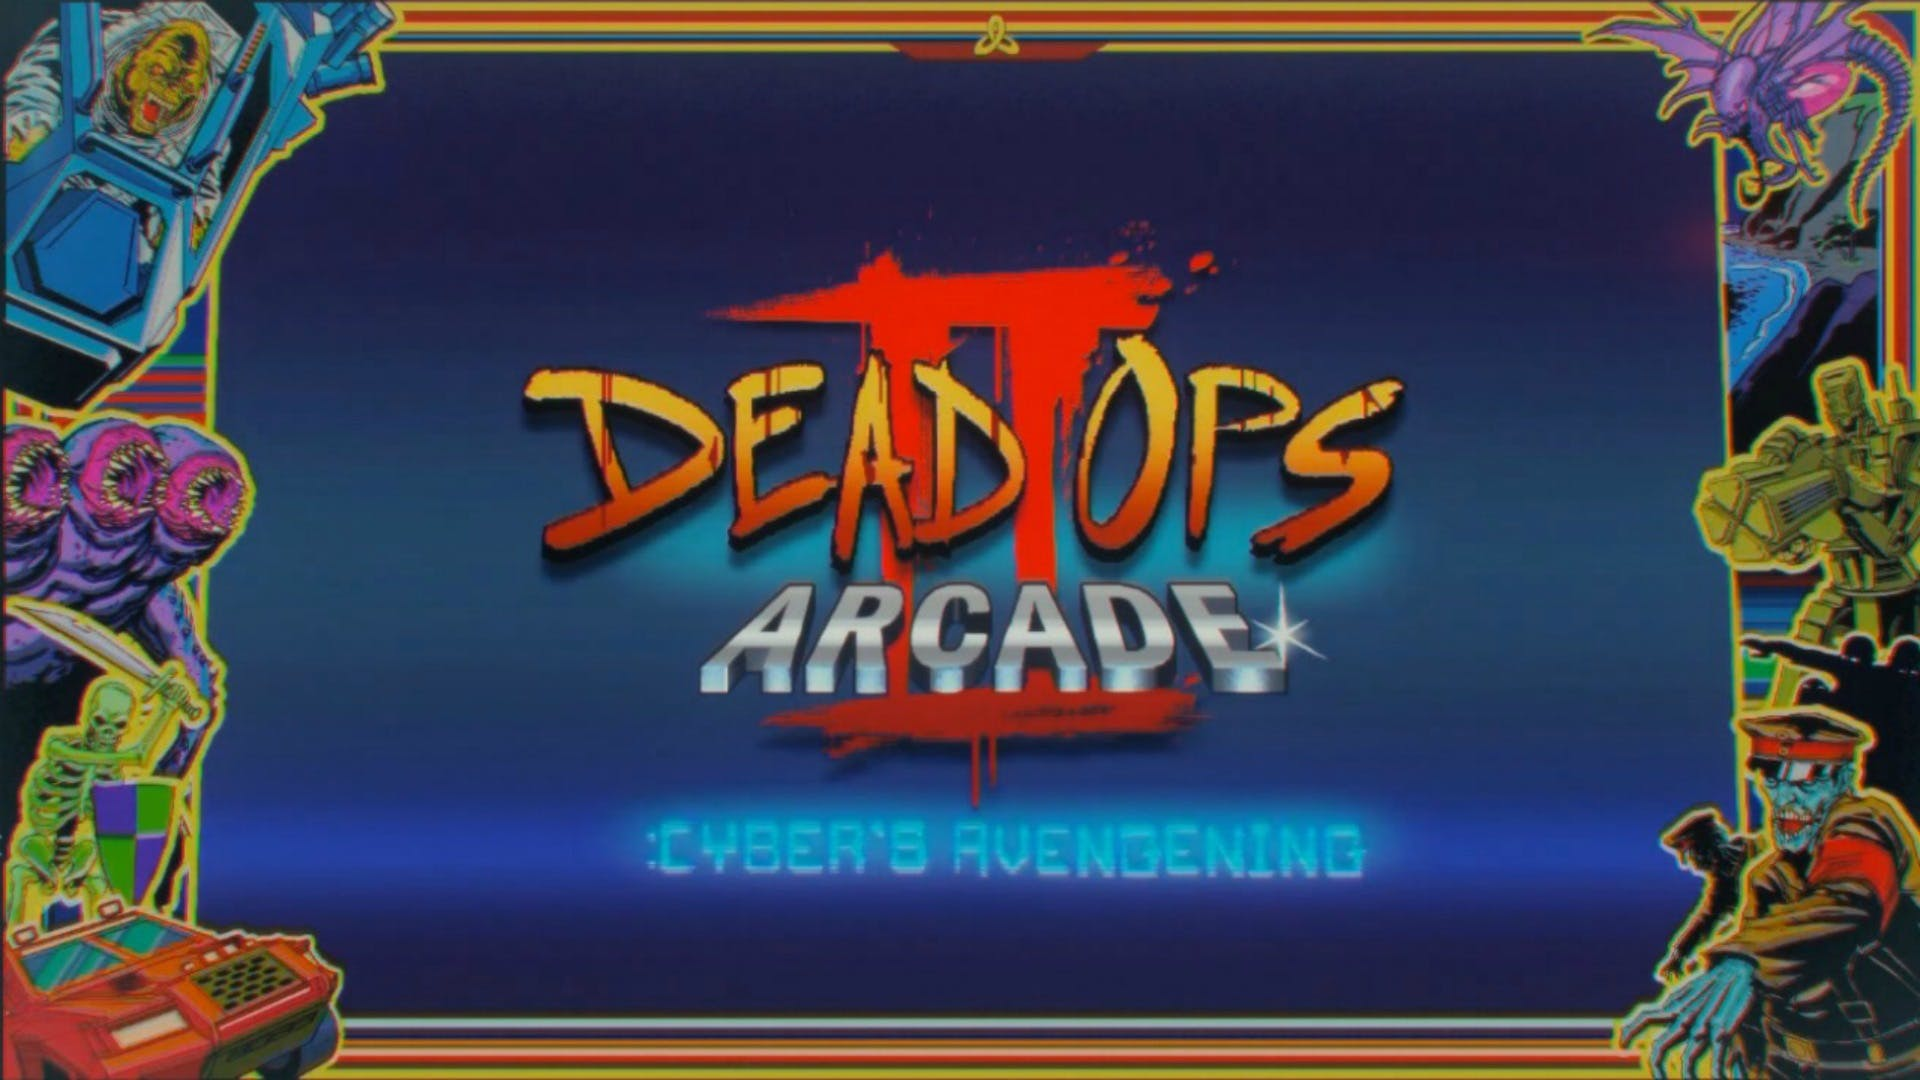 Dead ops arcade 2